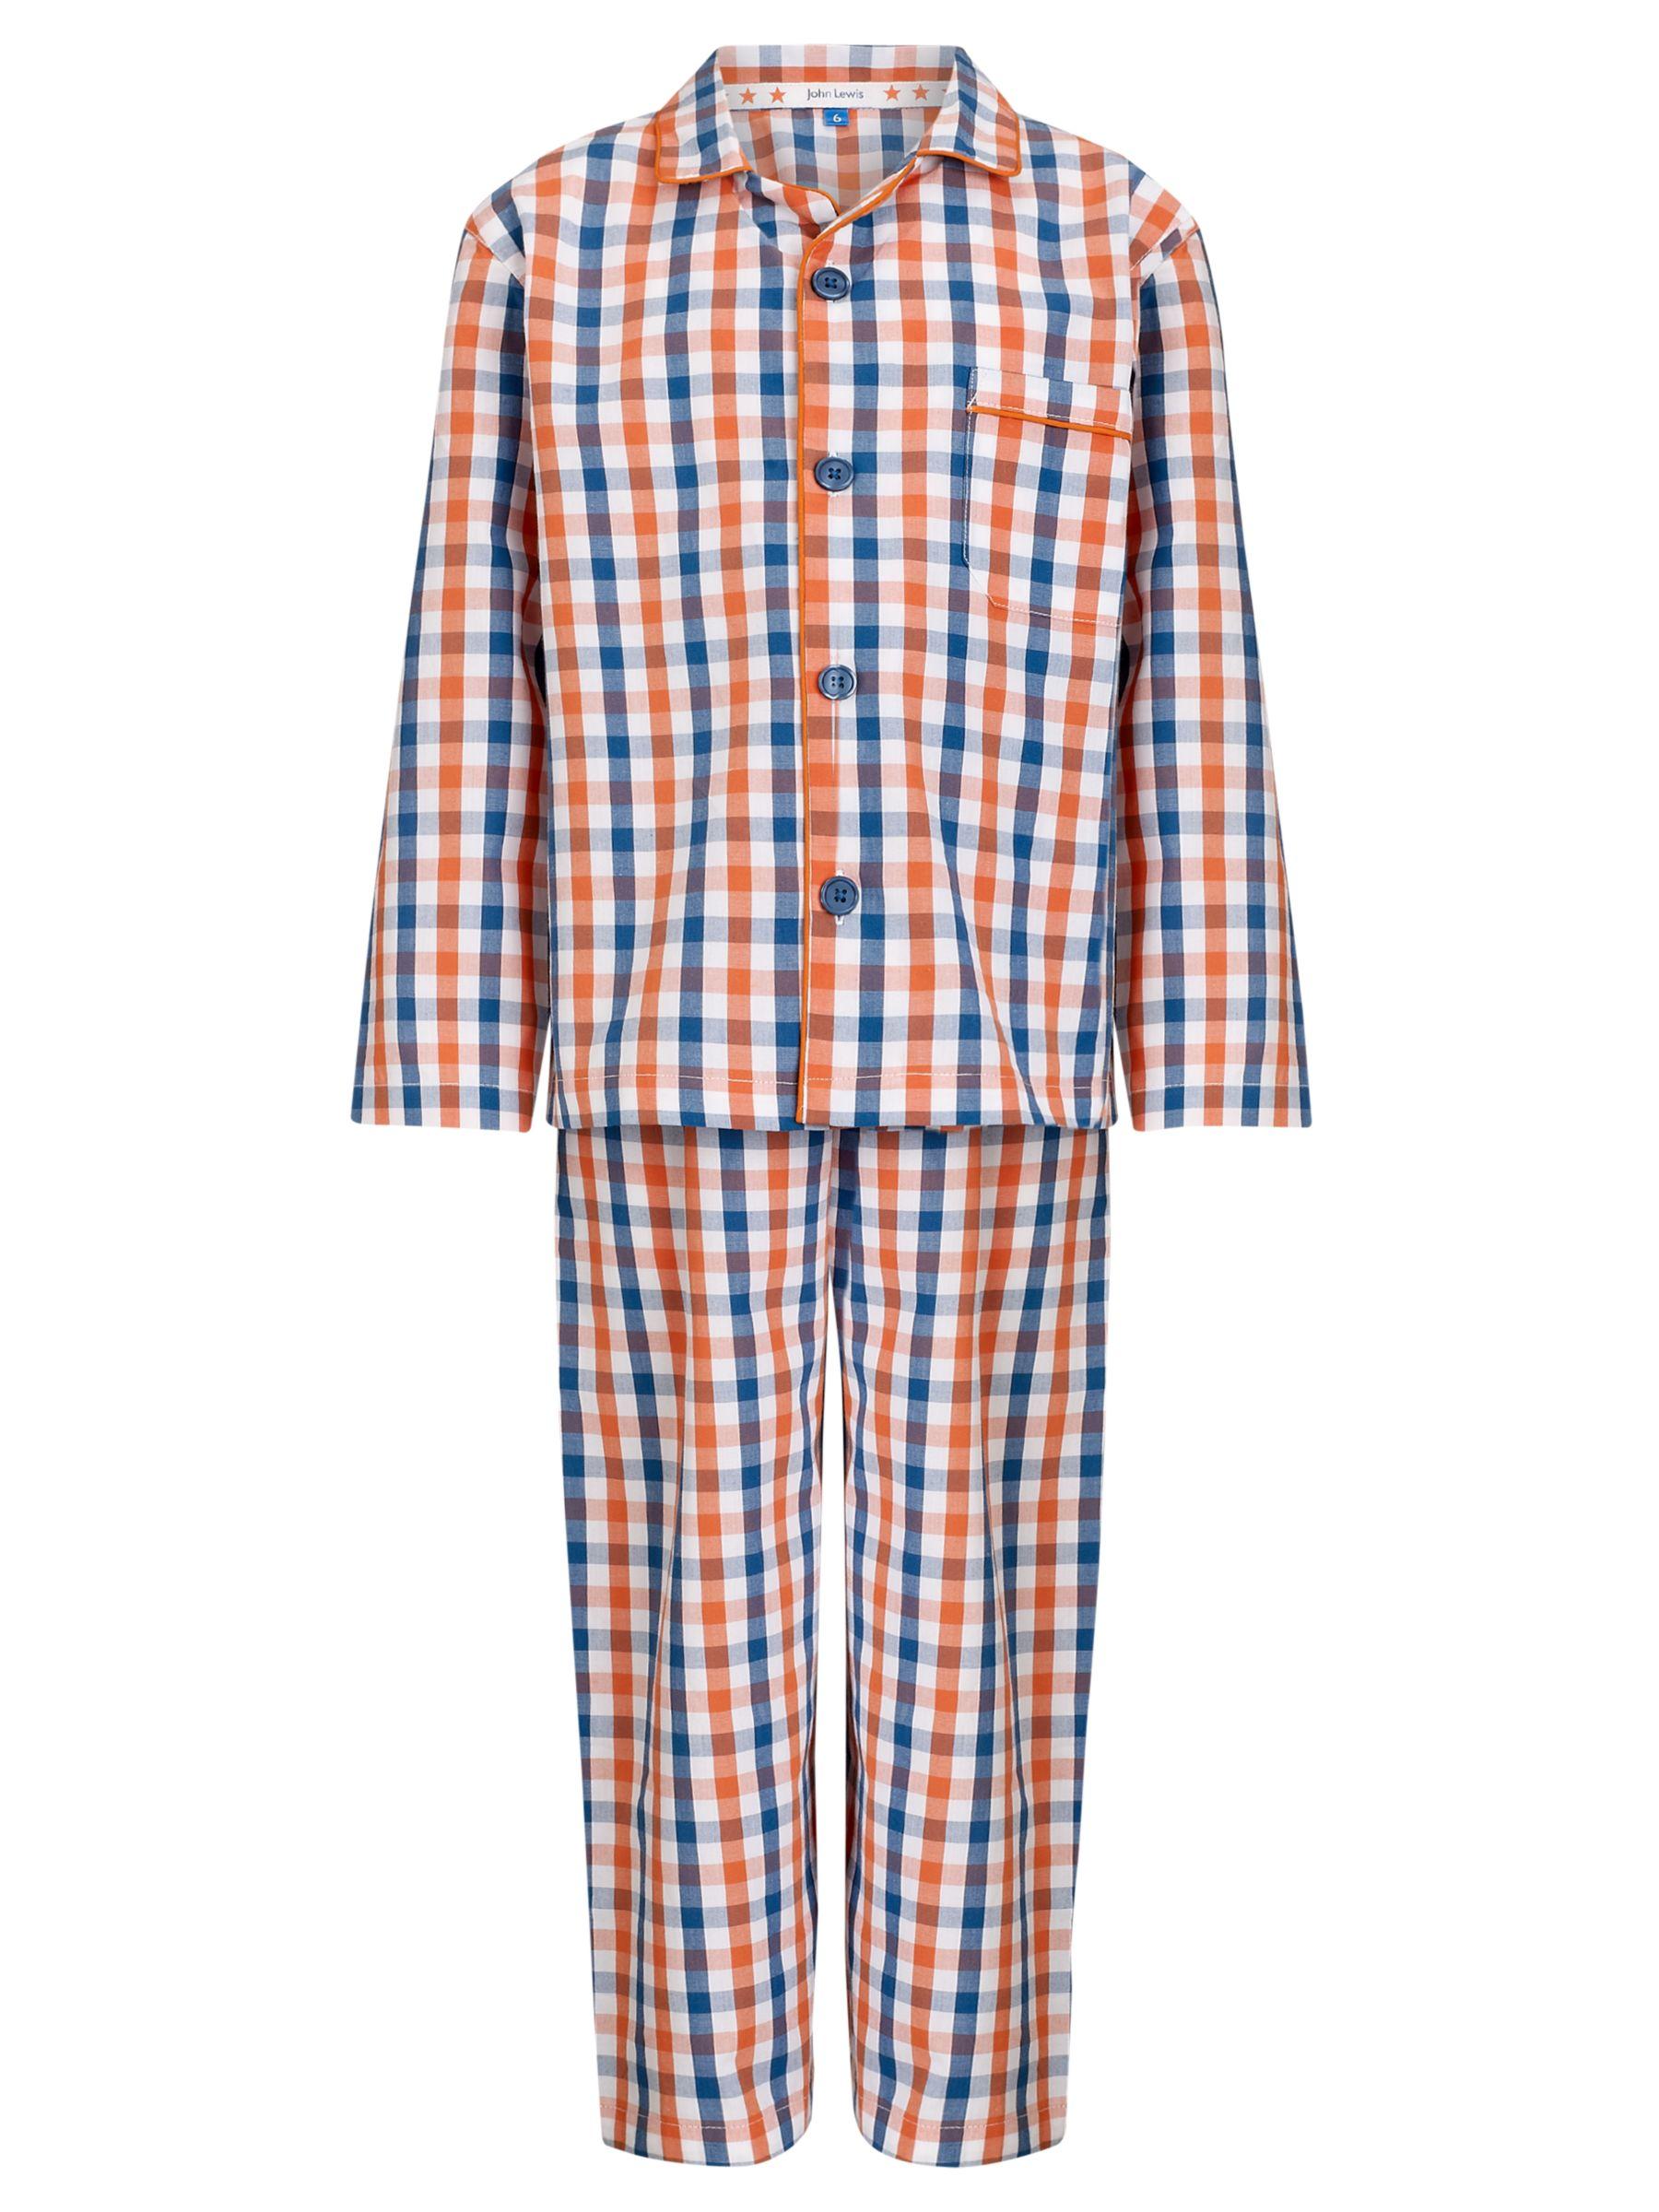 John Lewis Boy Gingham Checked Pyjamas, Orange/Blue